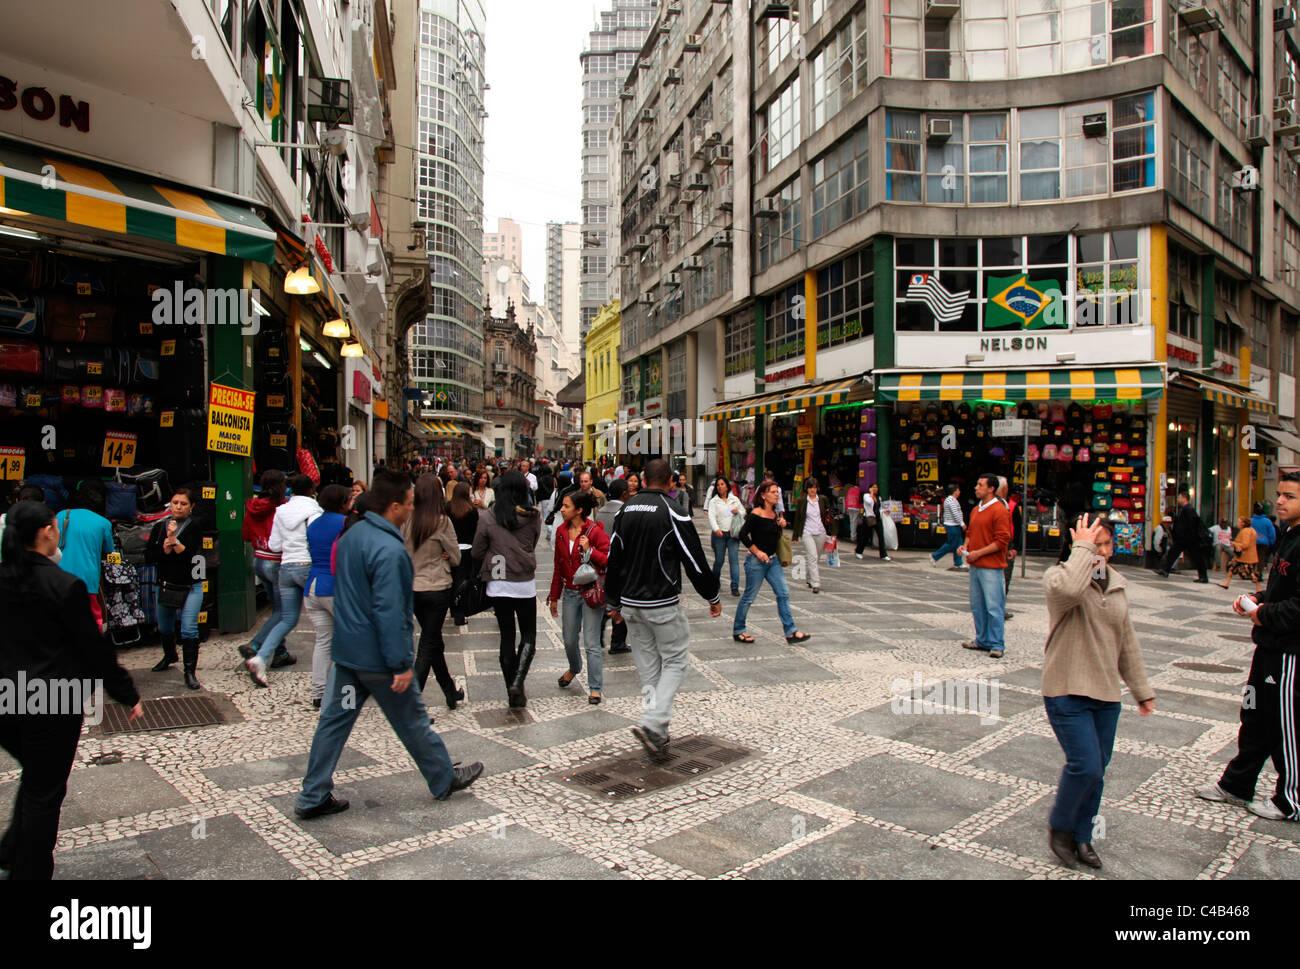 Zona peatonal en el centro de Sao Paulo. Brasil Imagen De Stock